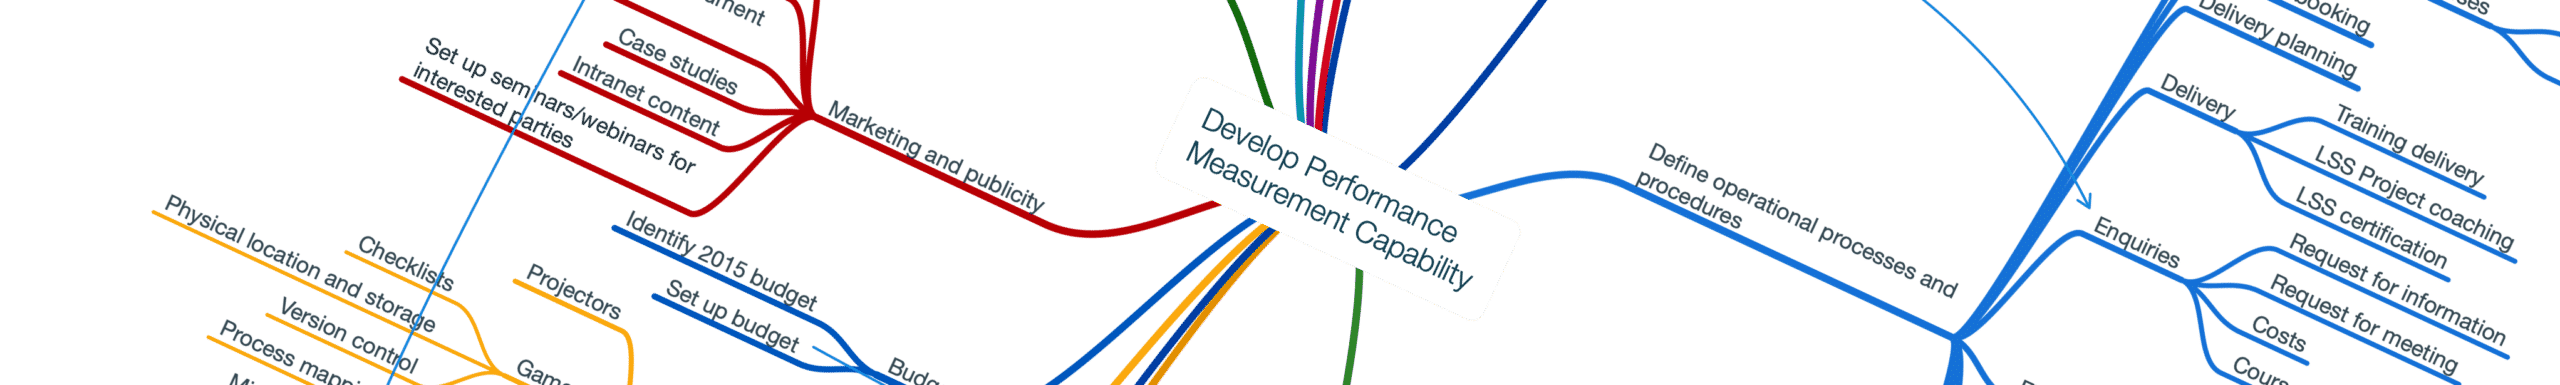 Measurement Capability Mindmap